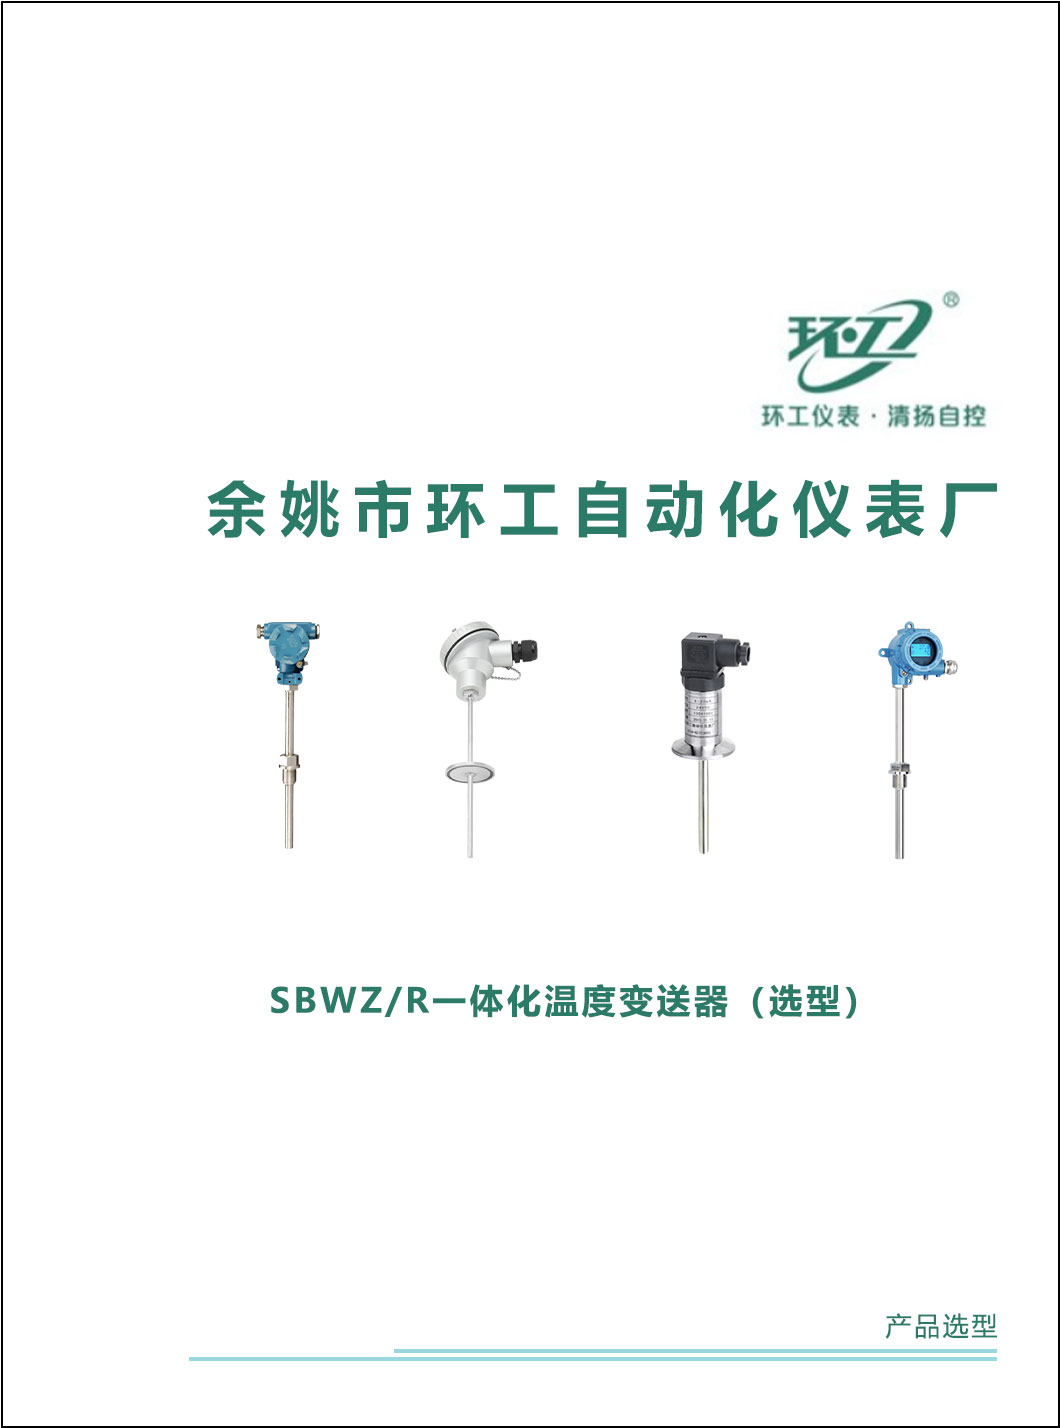 SBWZ/R一体化温度变送器-环工仪表-清扬自控